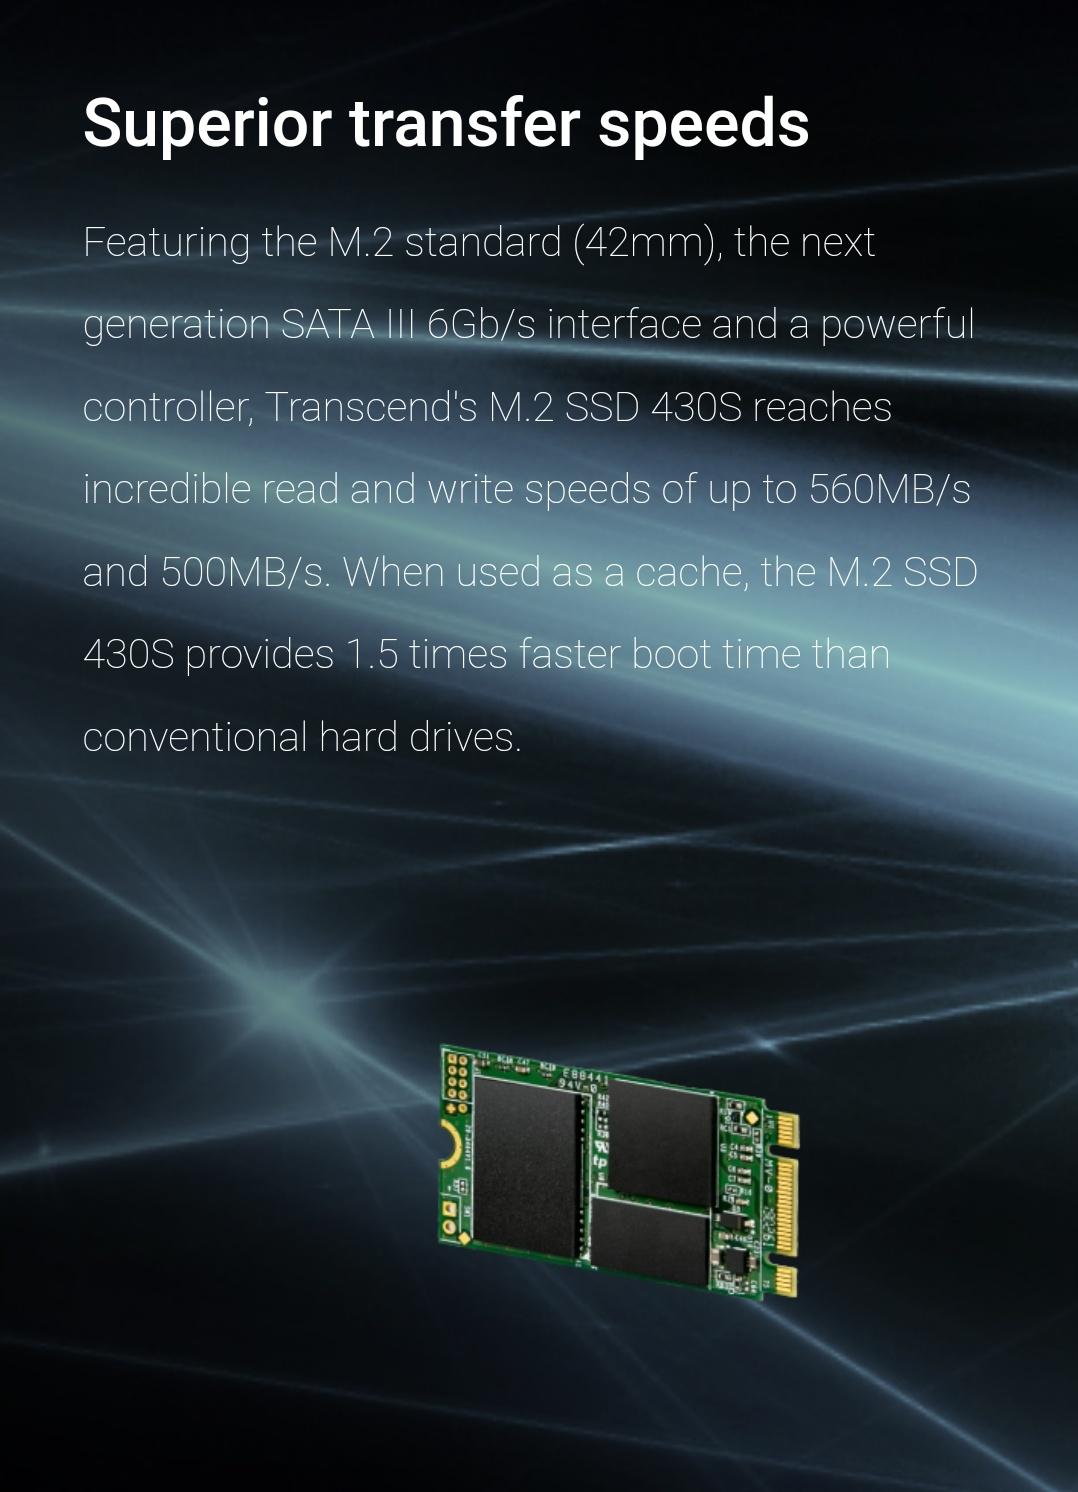 Transcend 512Go - M.2 SSD 430S - Belchine - 4